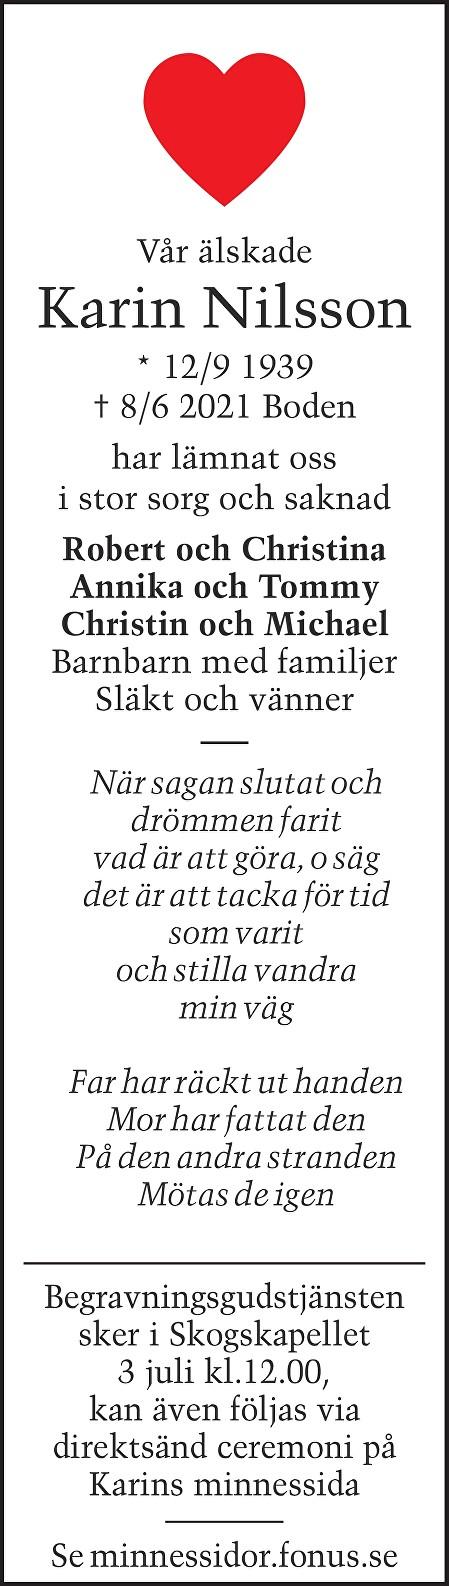 Karin Nilsson Death notice